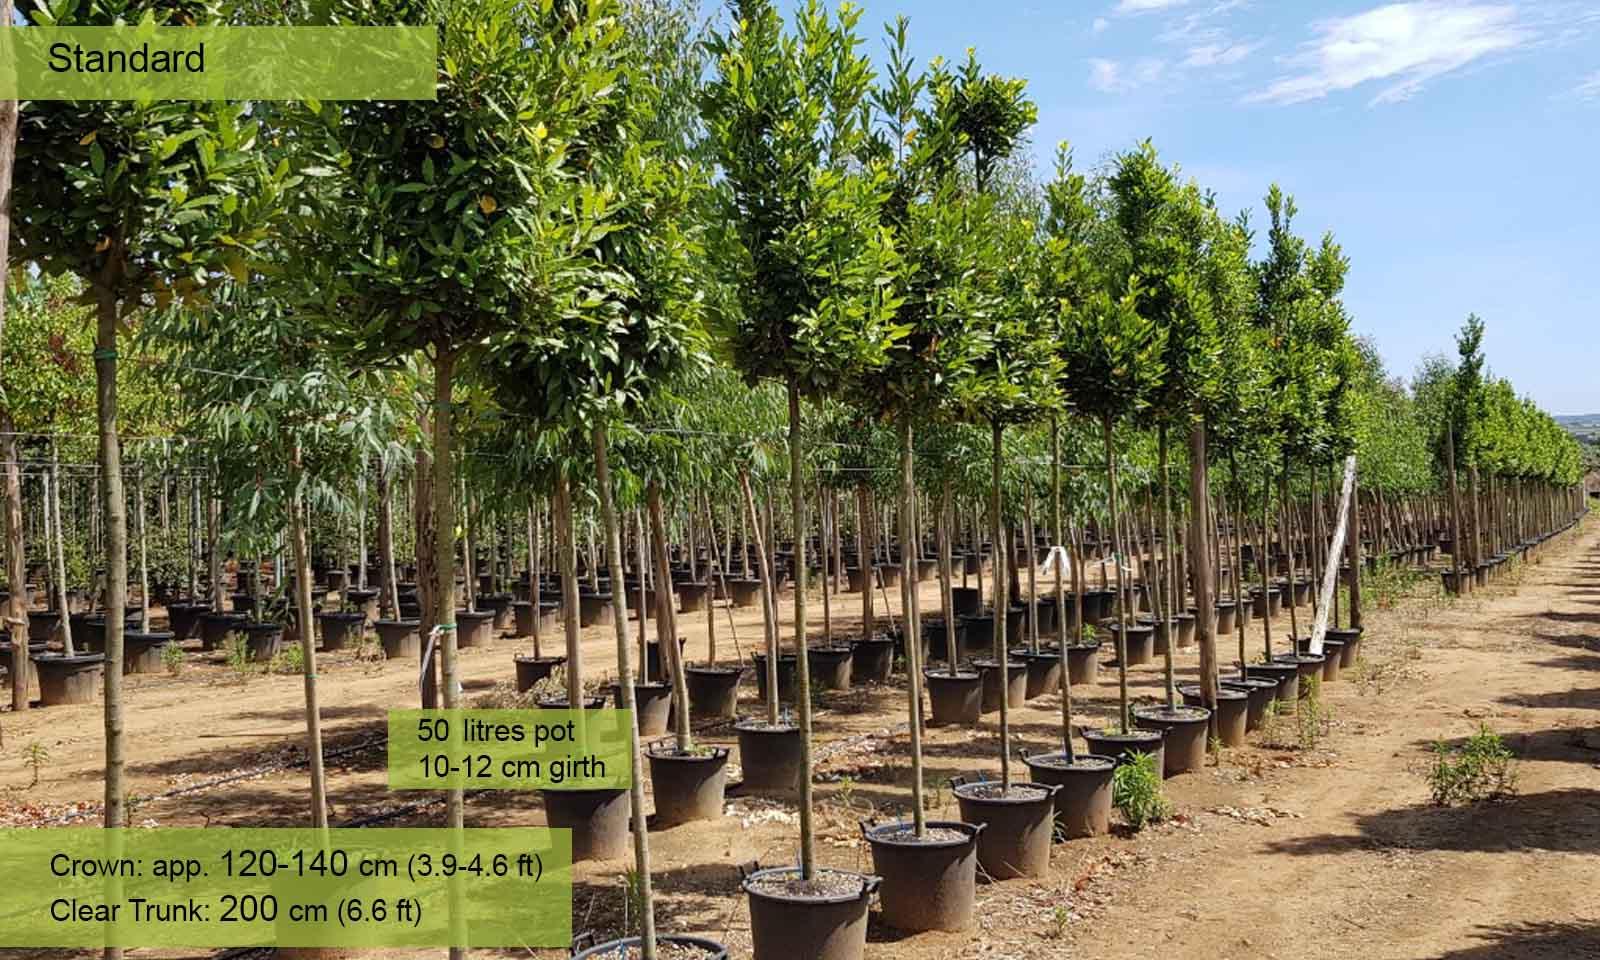 Laurus Nobilis (Bay Tree) – Standard